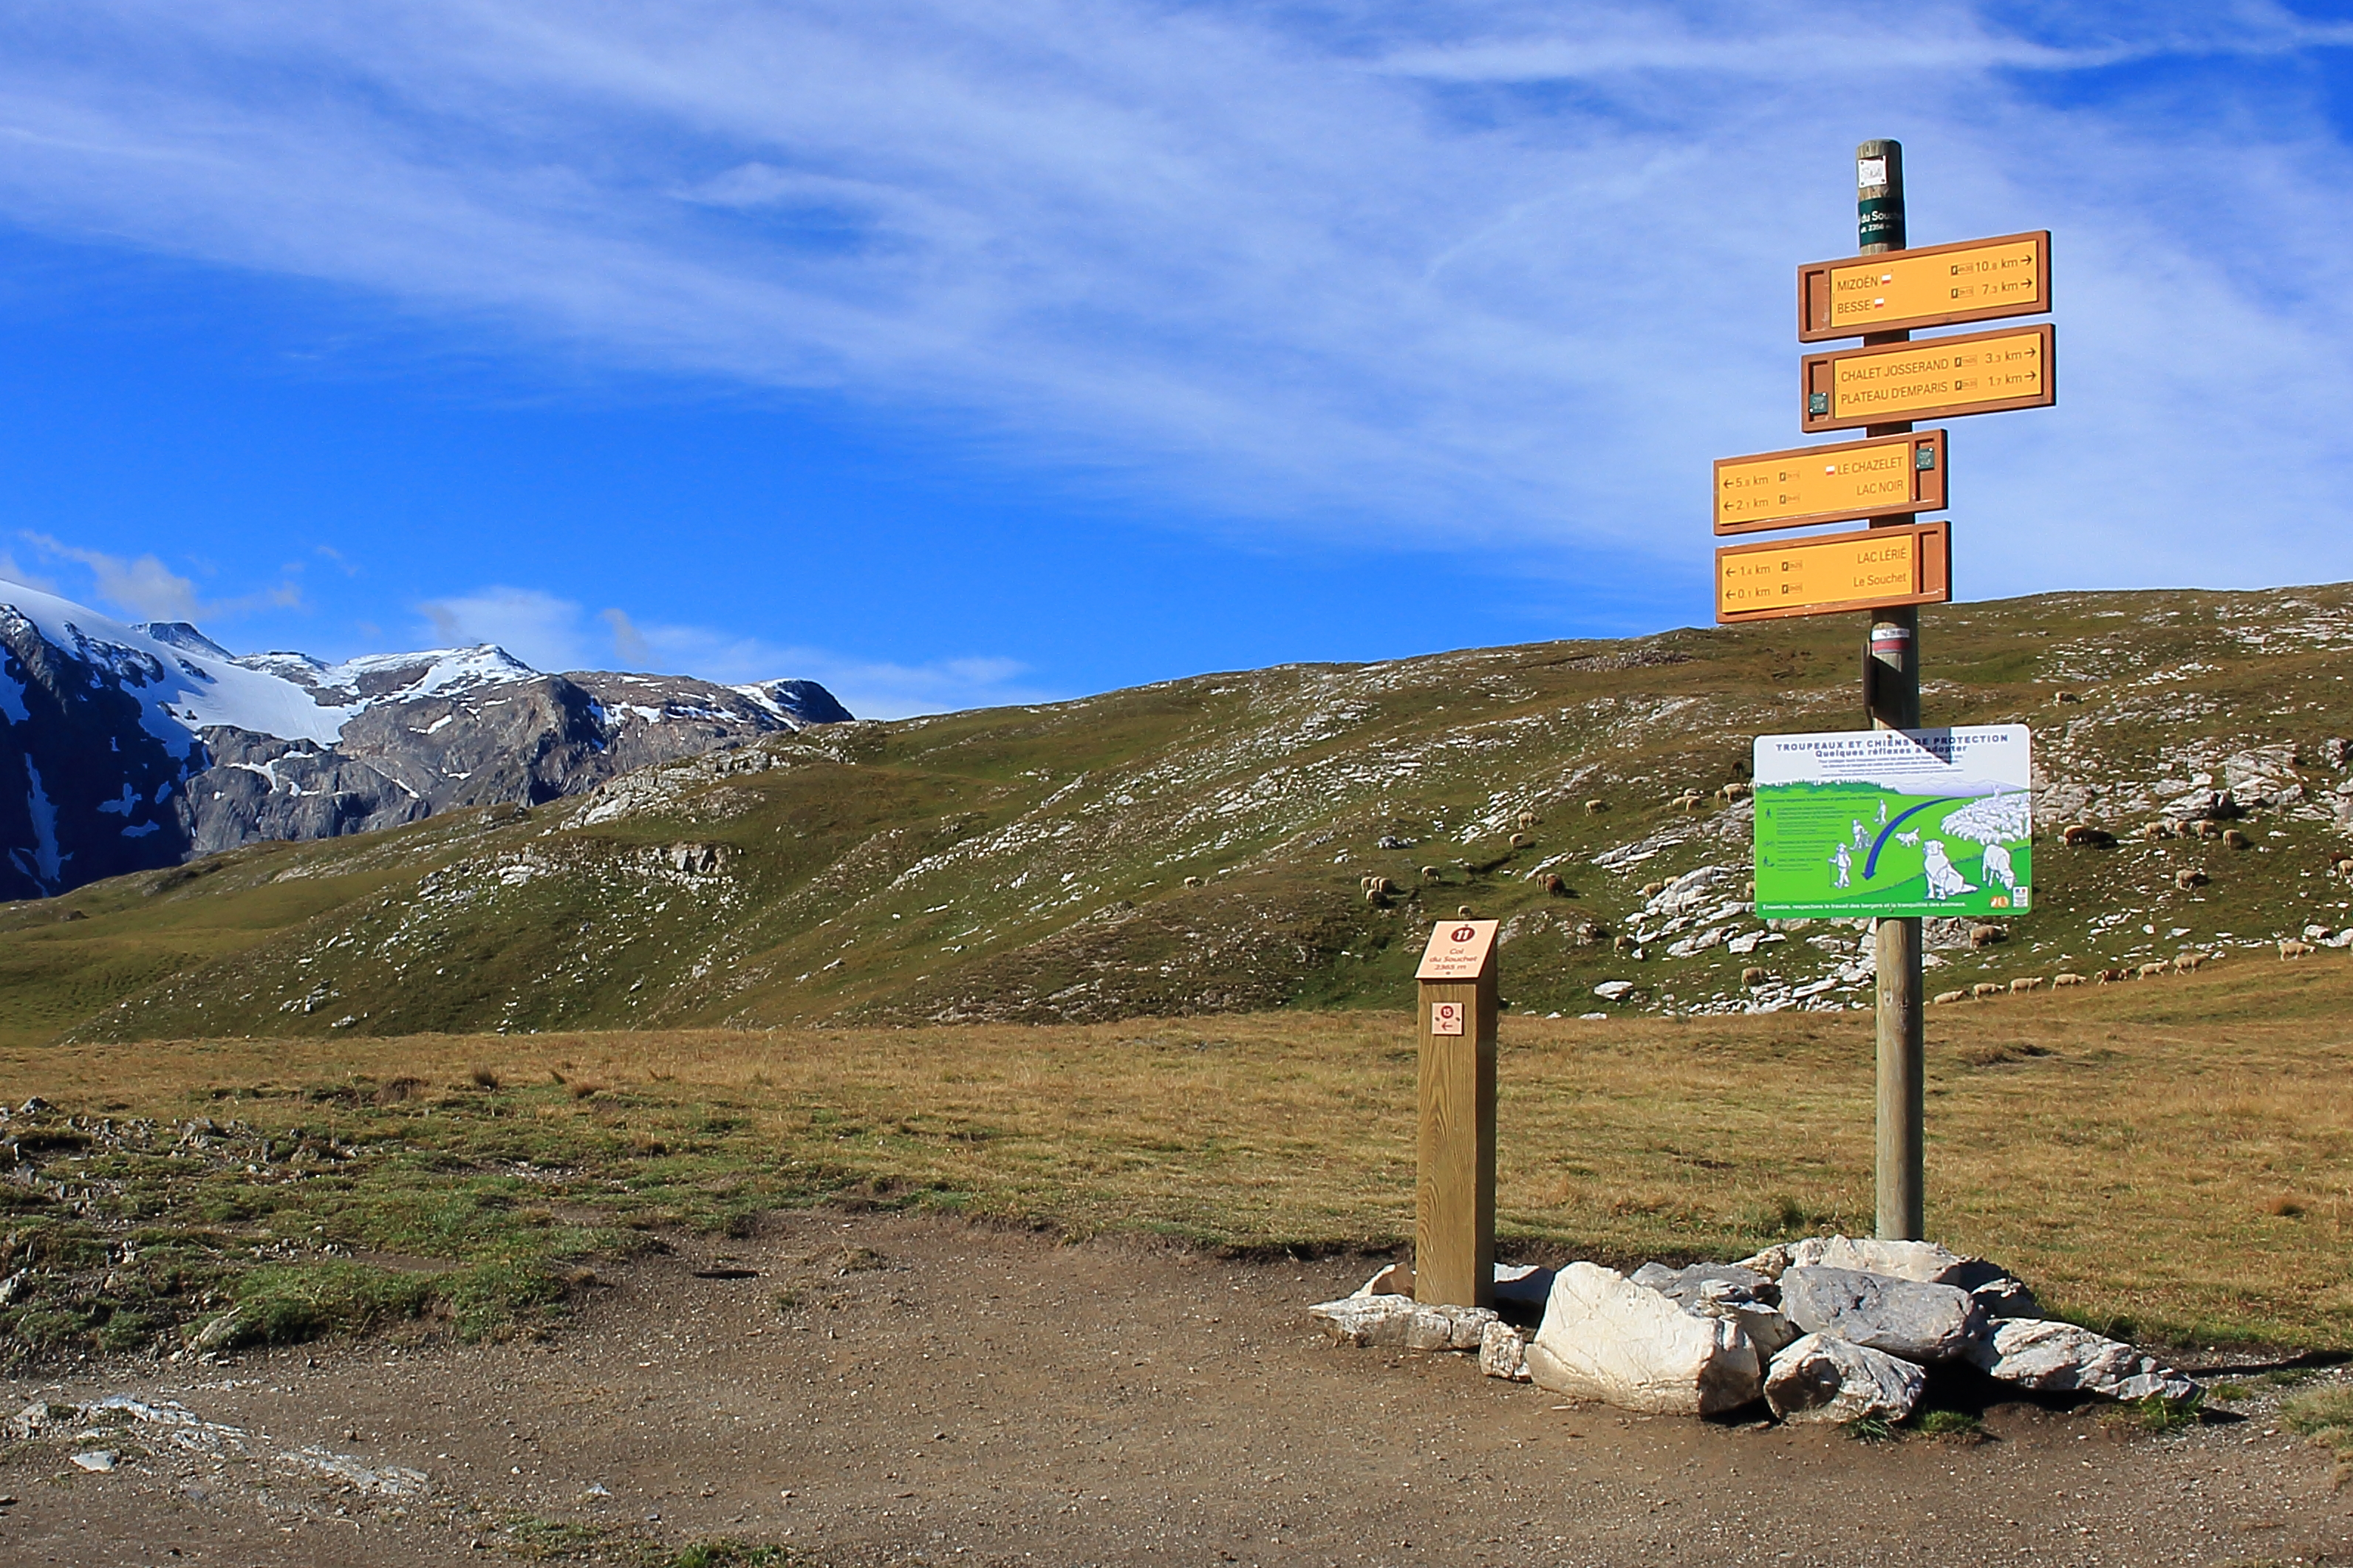 File:Col du Souchet, La Grave, Frankrijk (2356 m.) Landmark